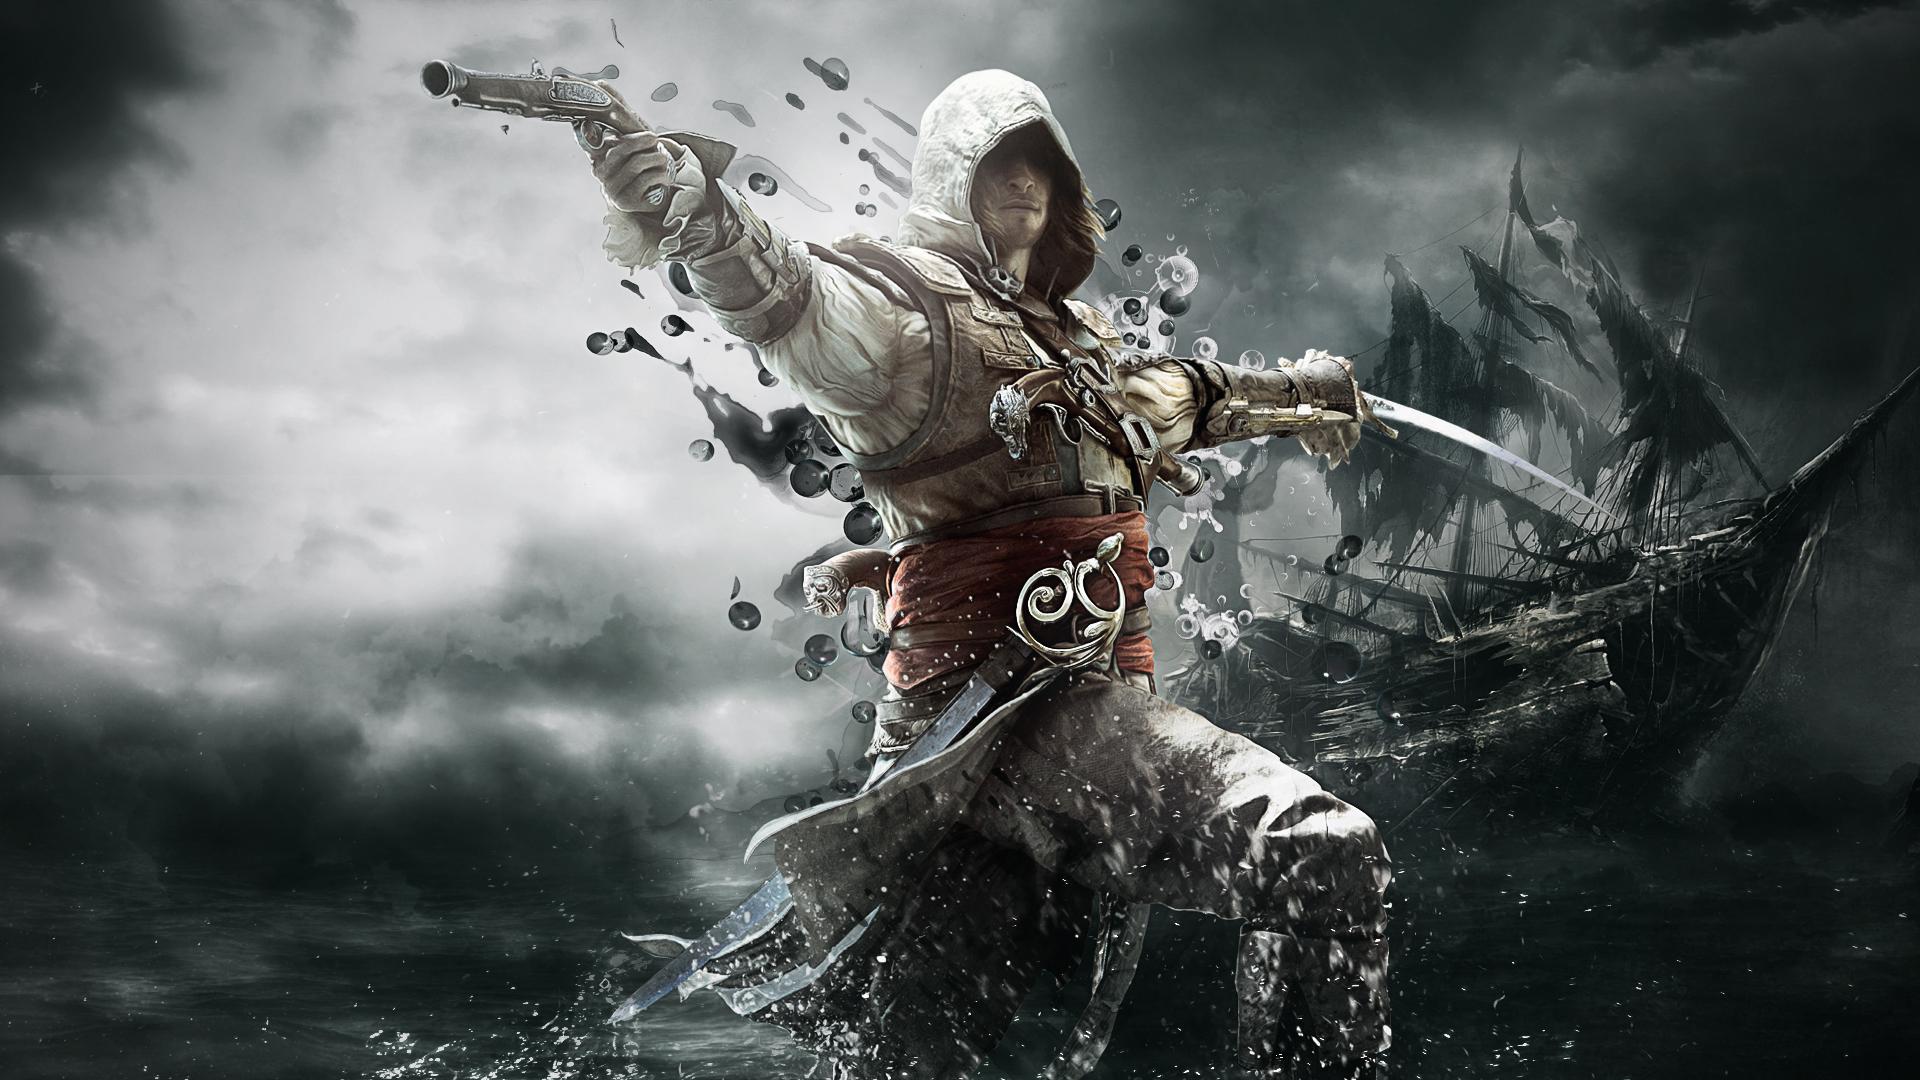 Assassins Creed IV Black Flag Wallpaper 803604 1920x1080